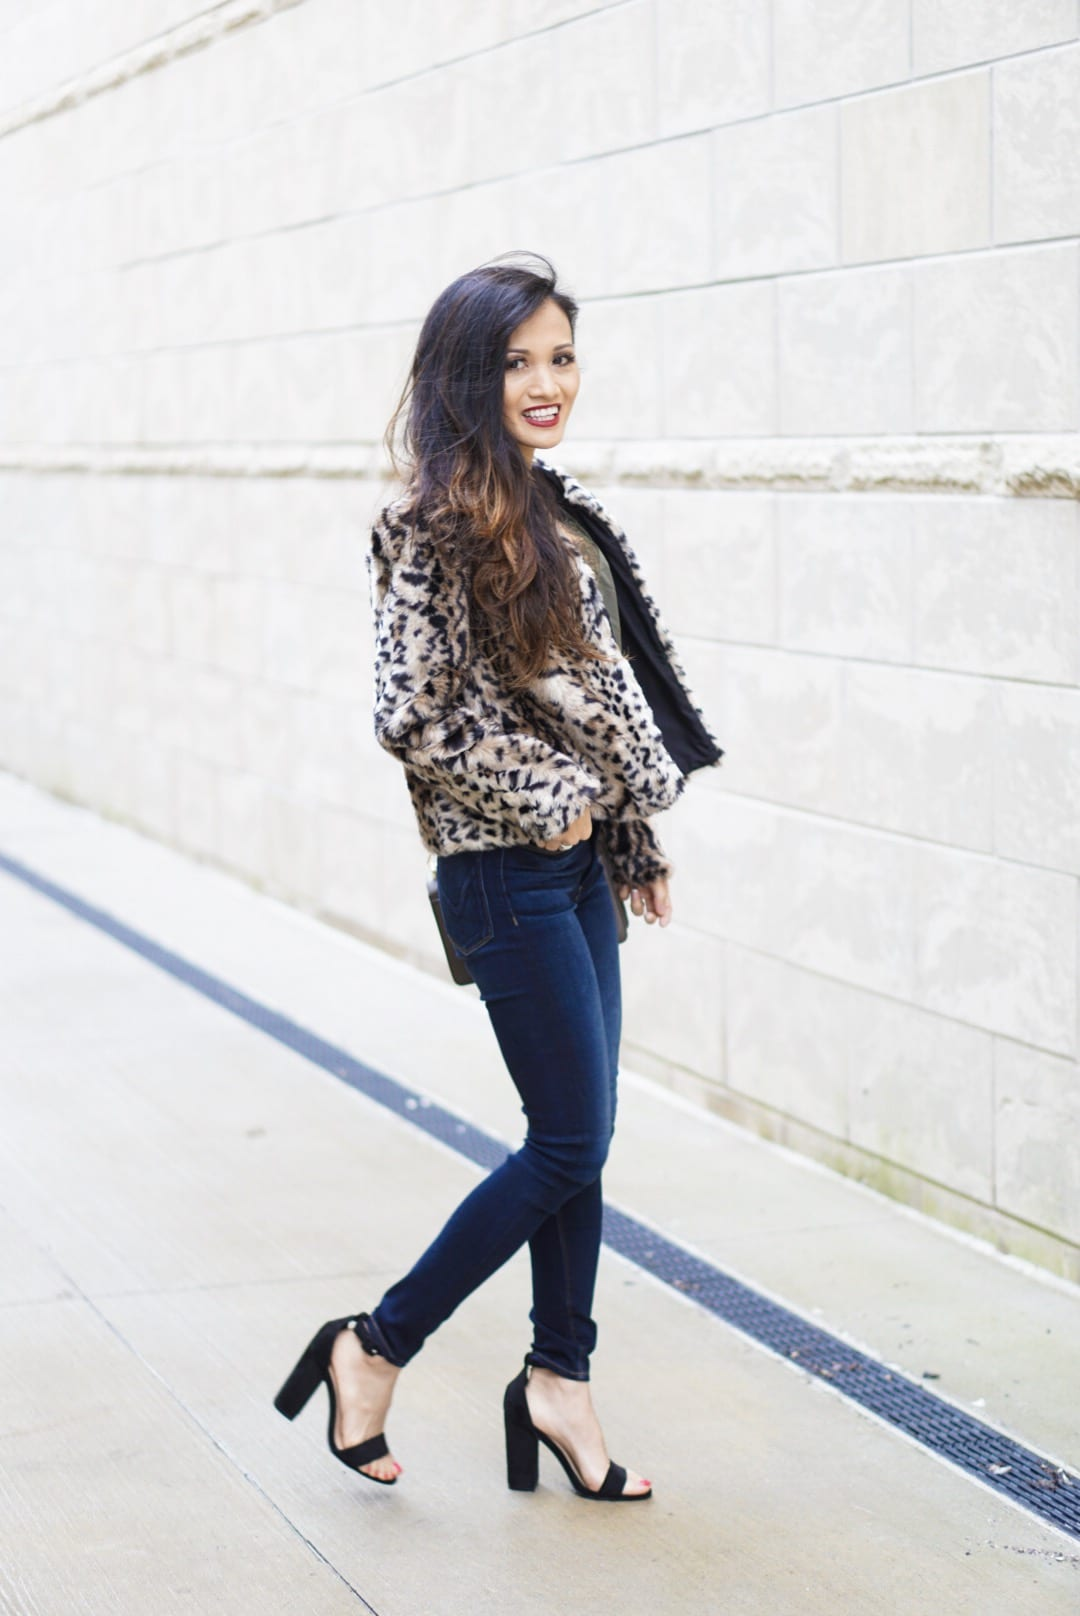 leopard coat, leopard jacket, leopard coat outfit, Evereve, free people bralette, lace cami, Rebecca mink off love crossbody bag, Steve Madden black sandals, date night outfit, initial necklace, Hudson skinny jeans